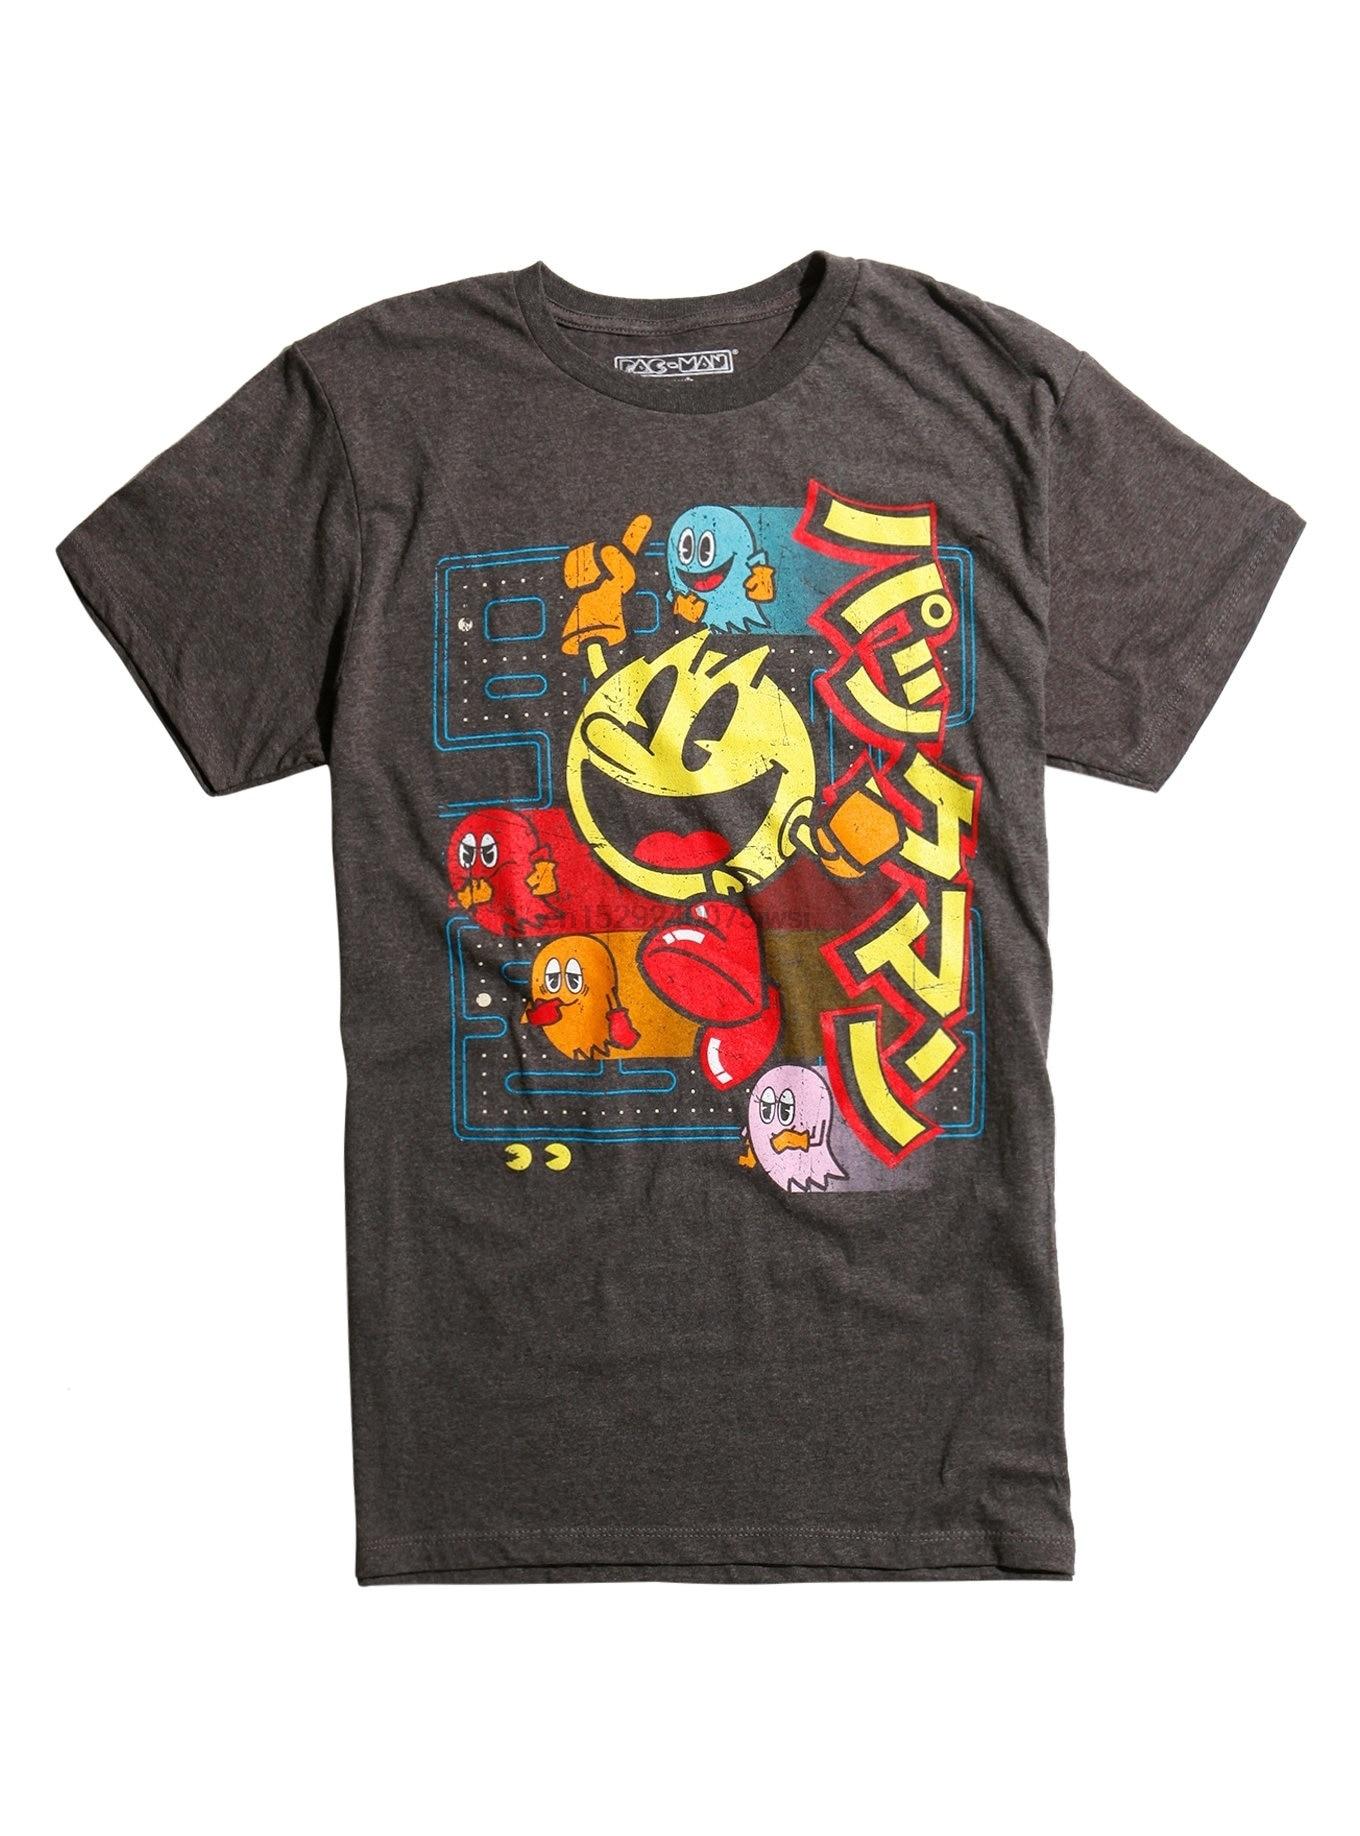 Foshion, Camiseta de algodón de manga corta para hombre, camiseta poc-mon KoToKoNo, camisetas divertidas para hombre